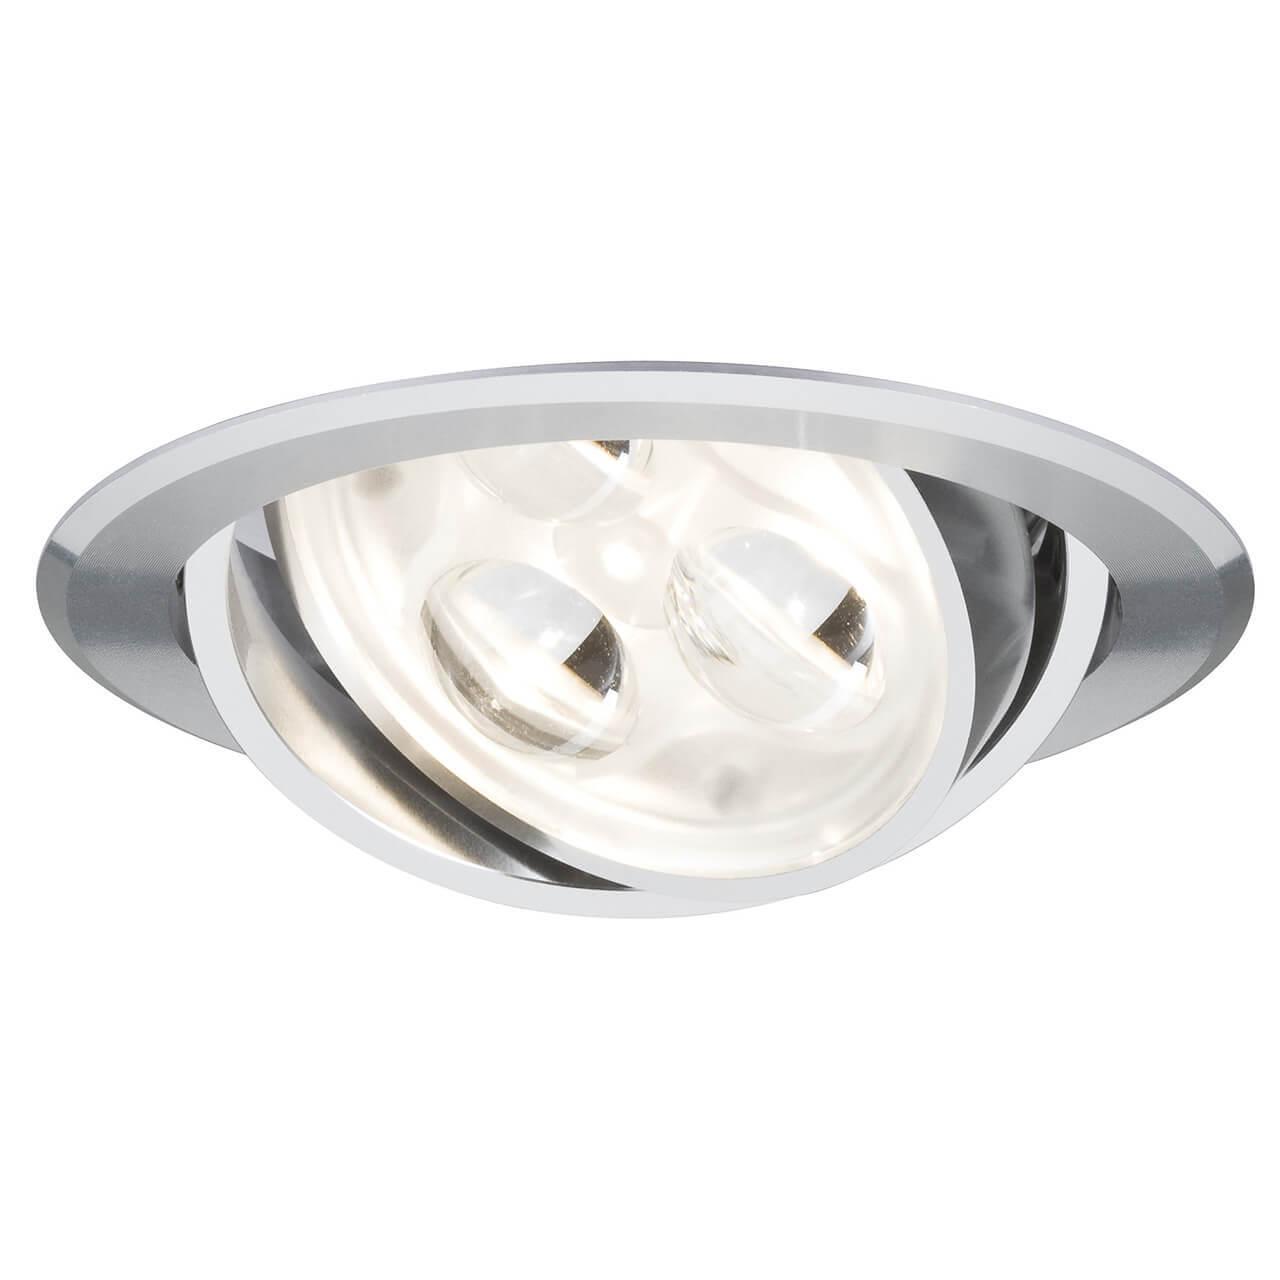 Мебельный светодиодный светильник Paulmann Micro Line Drilled Alu Led 93541 paulmann wd arneb ip23 led 1x9w chrom alu acryl